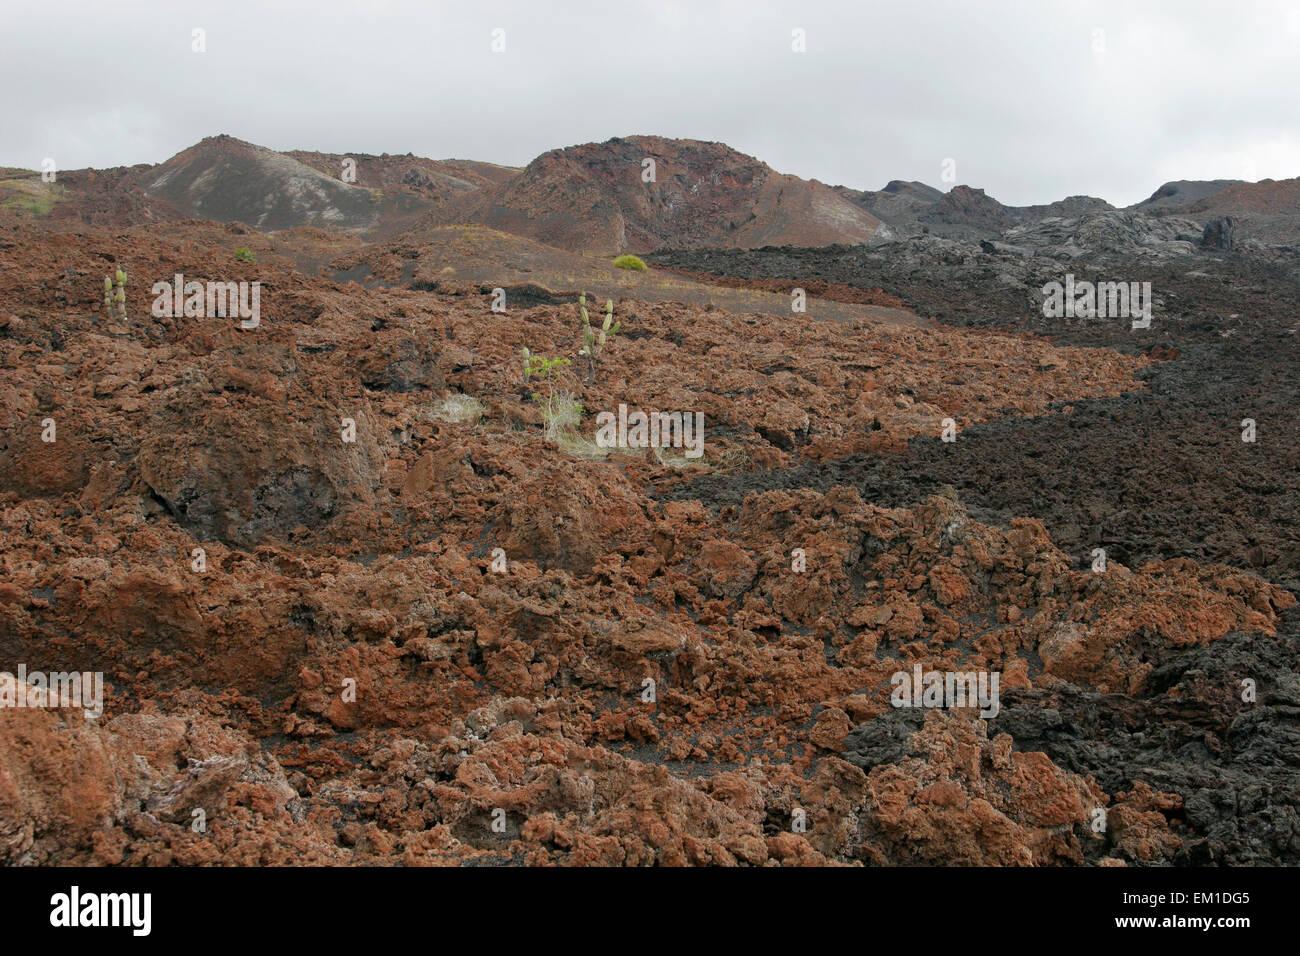 Lava fields of Sierra Negra volcano, Isabela Island, Galapagos, Ecuador, South America - Stock Image